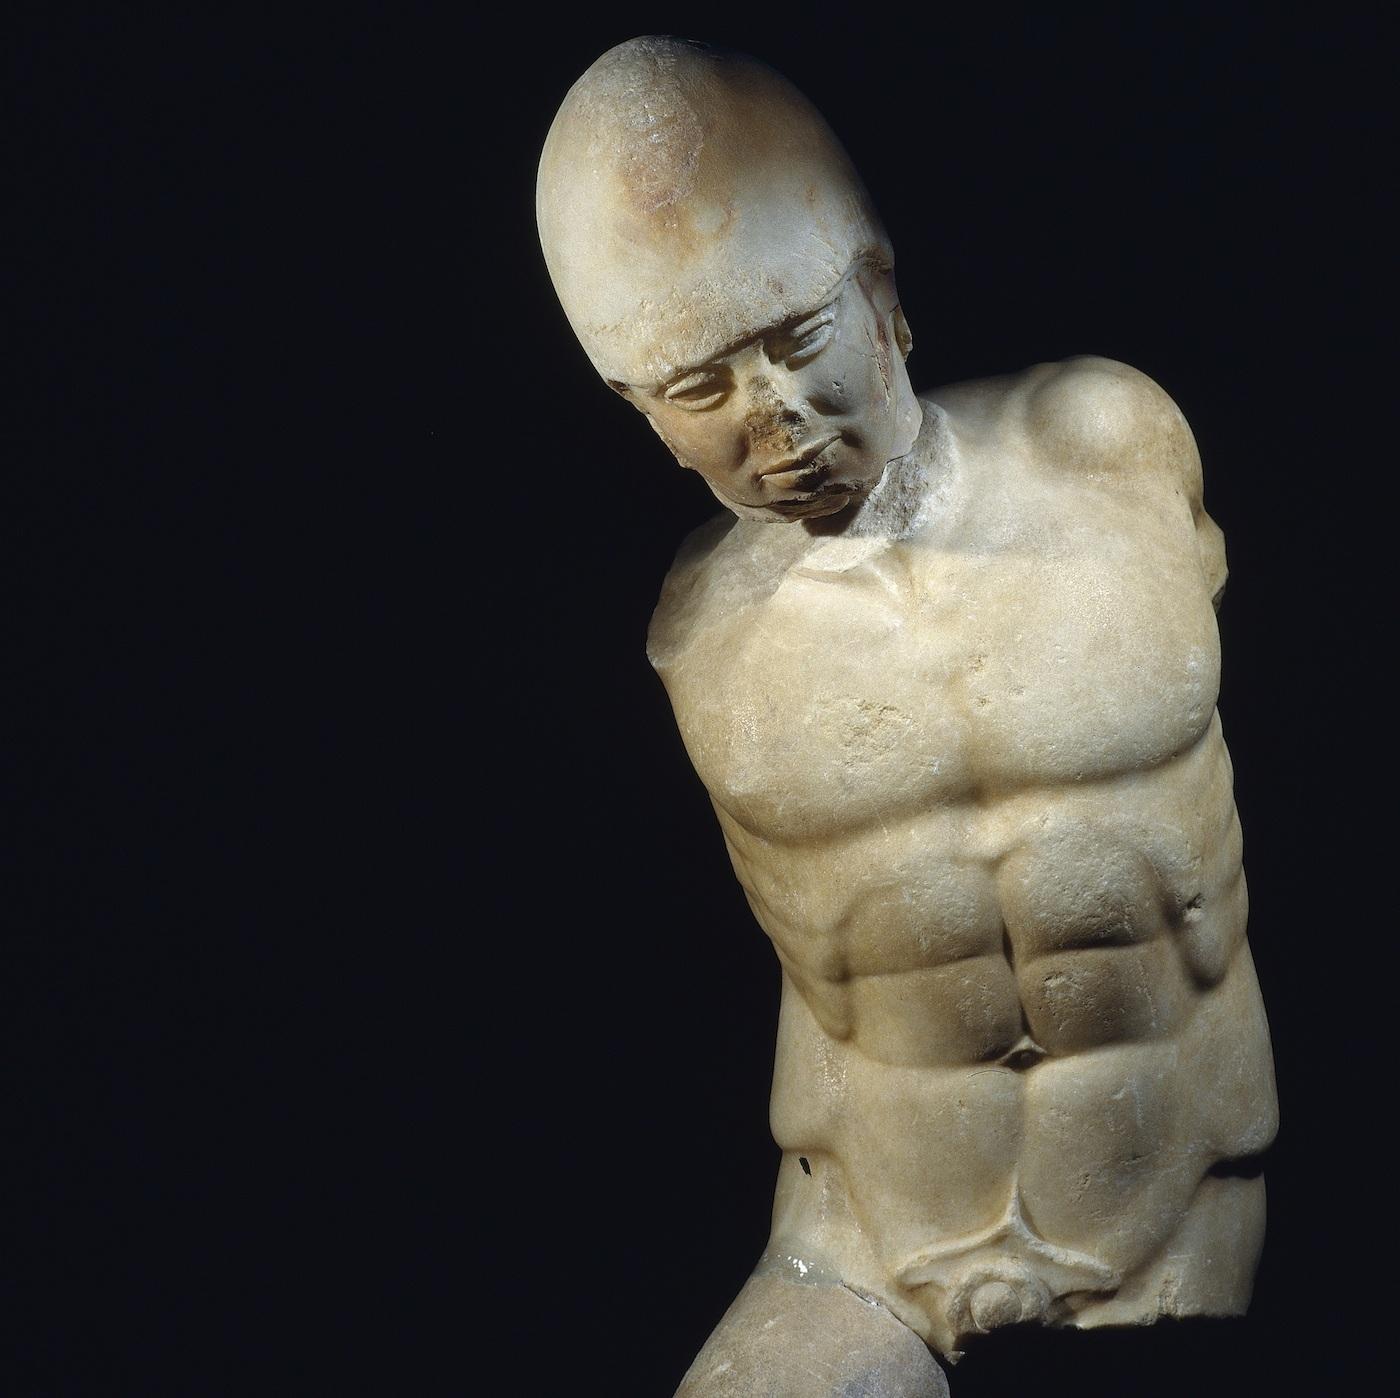 Marble statue of warrior, Akragas, Sicily (ca 470 BCE) (Museo Archeologico Regionale di Agrigento © Regione Siciliana)